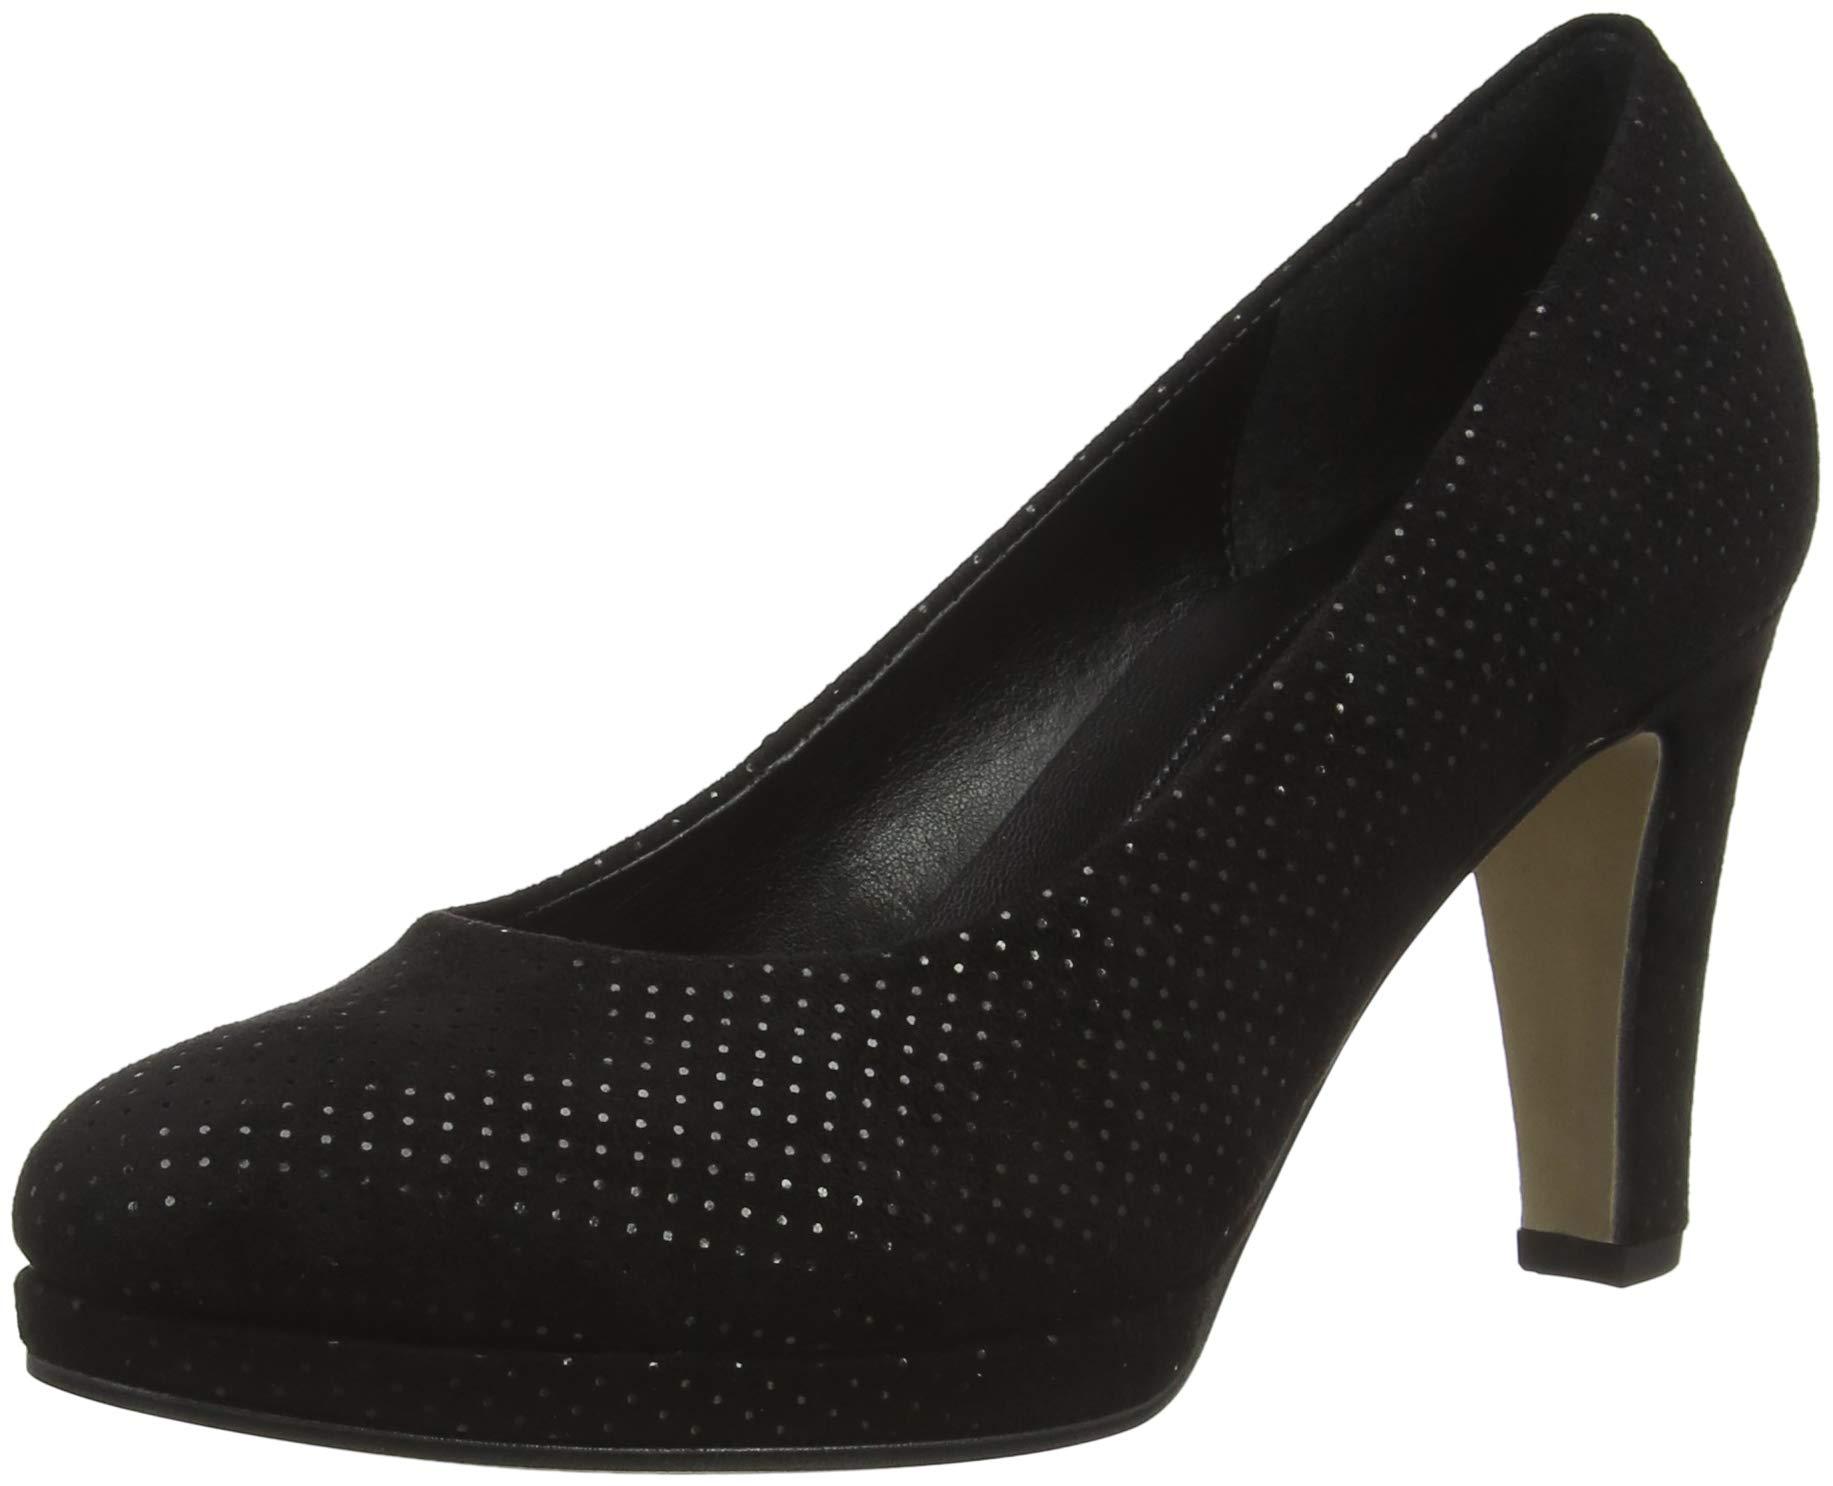 Shoes FashionEscarpins 5 5040 Gabor FemmeNoirschwarz Eu knO0wP